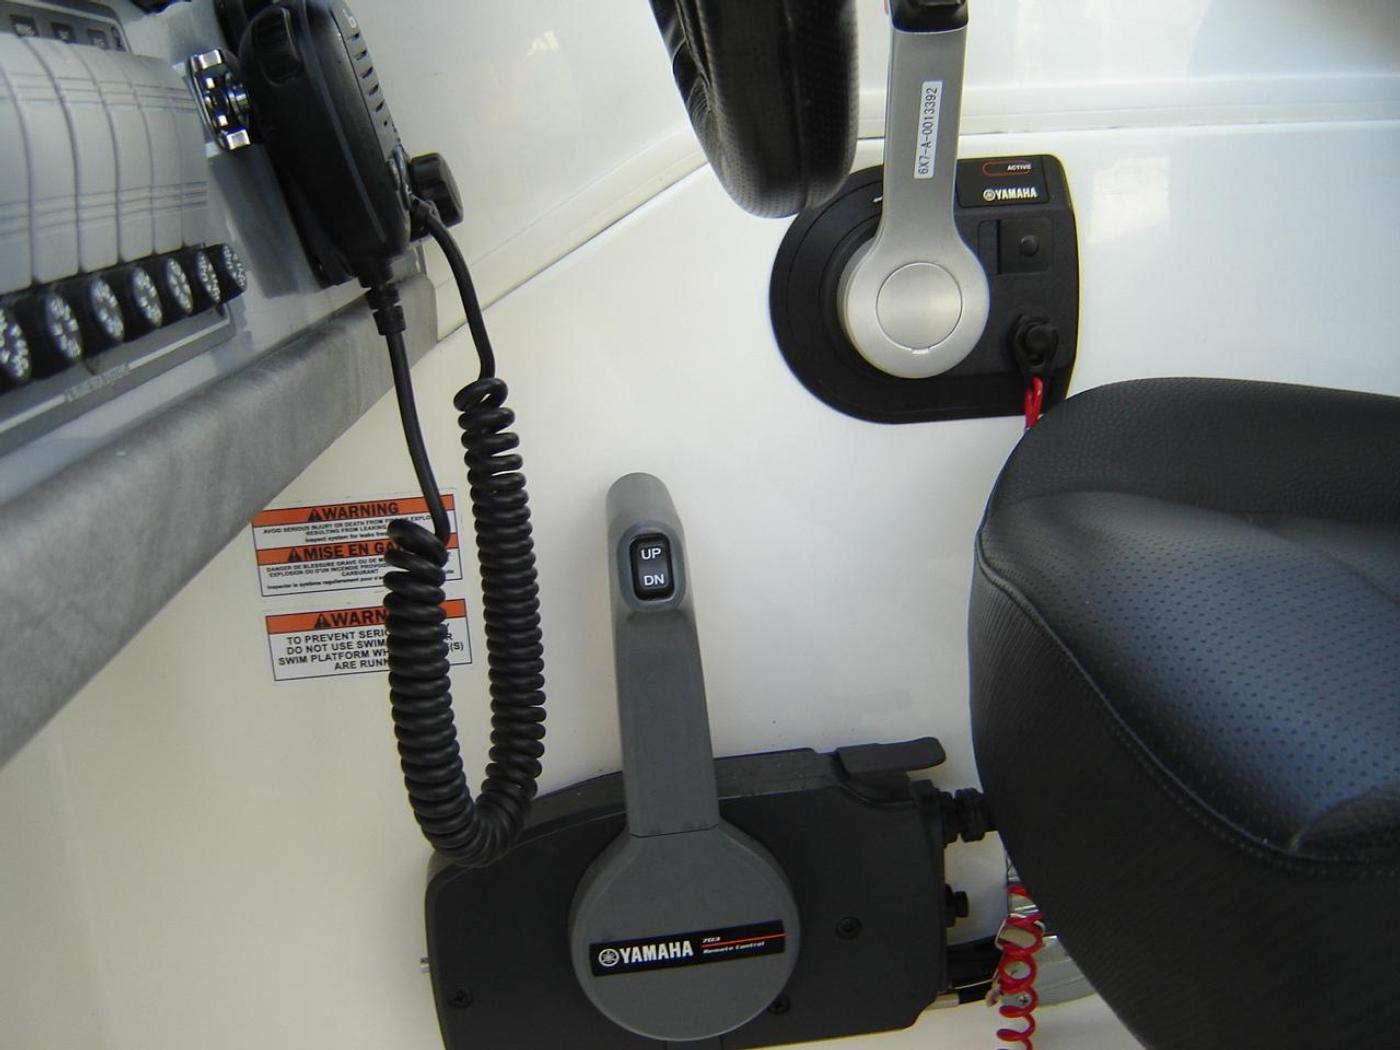 2019 Monaro 235 Sport, Controls for Main & Kicker at Helm